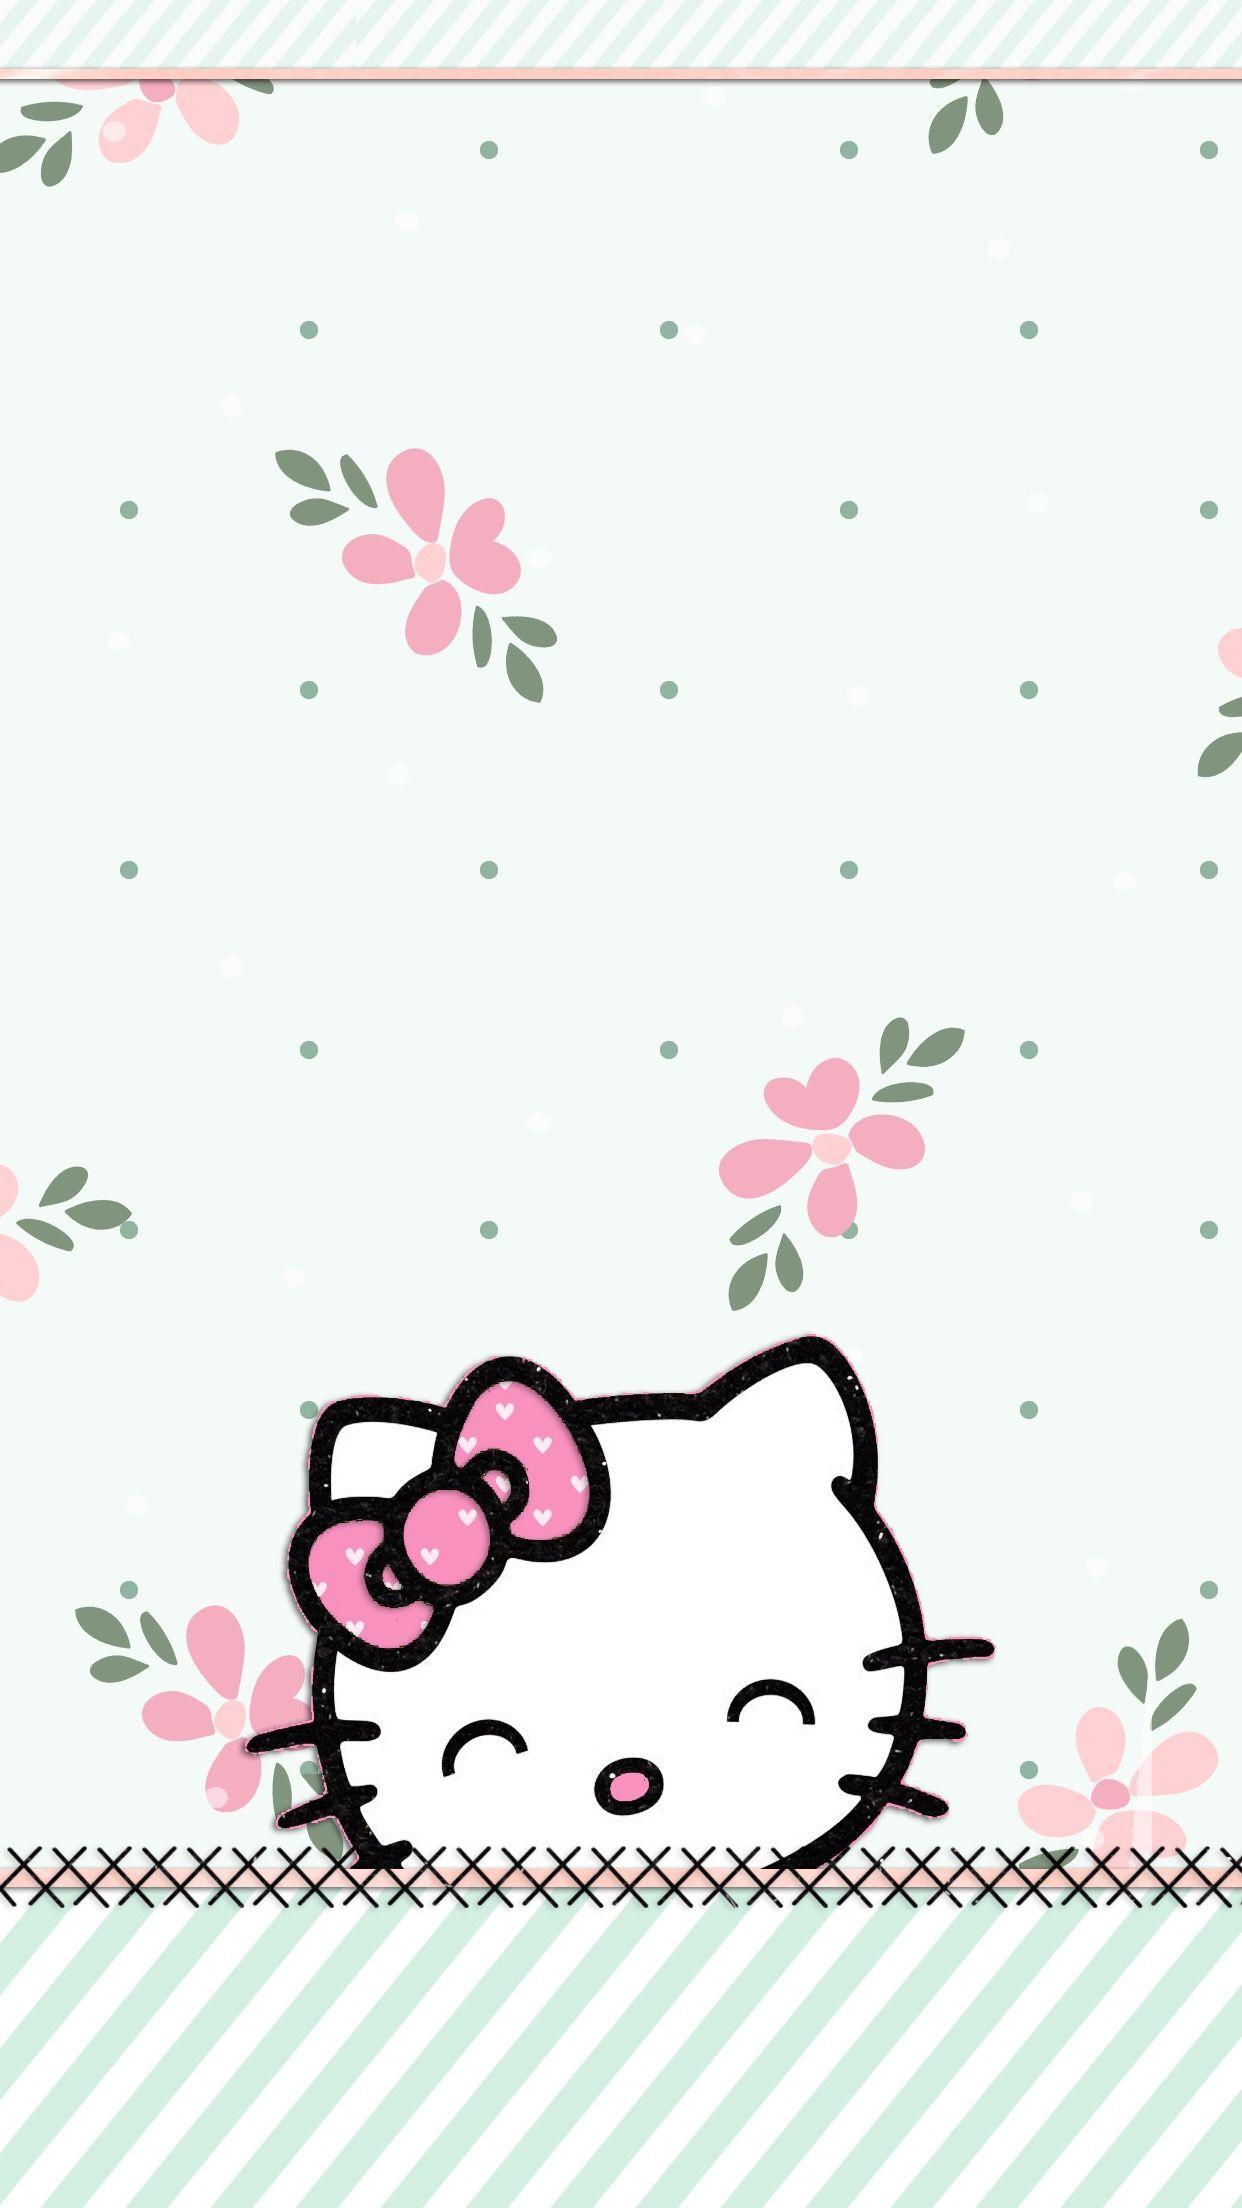 Amazing Wallpaper Hello Kitty Cell Phone - 2aac491430ae1b46fae6eb4ee0b617ae  Photograph_706185.jpg